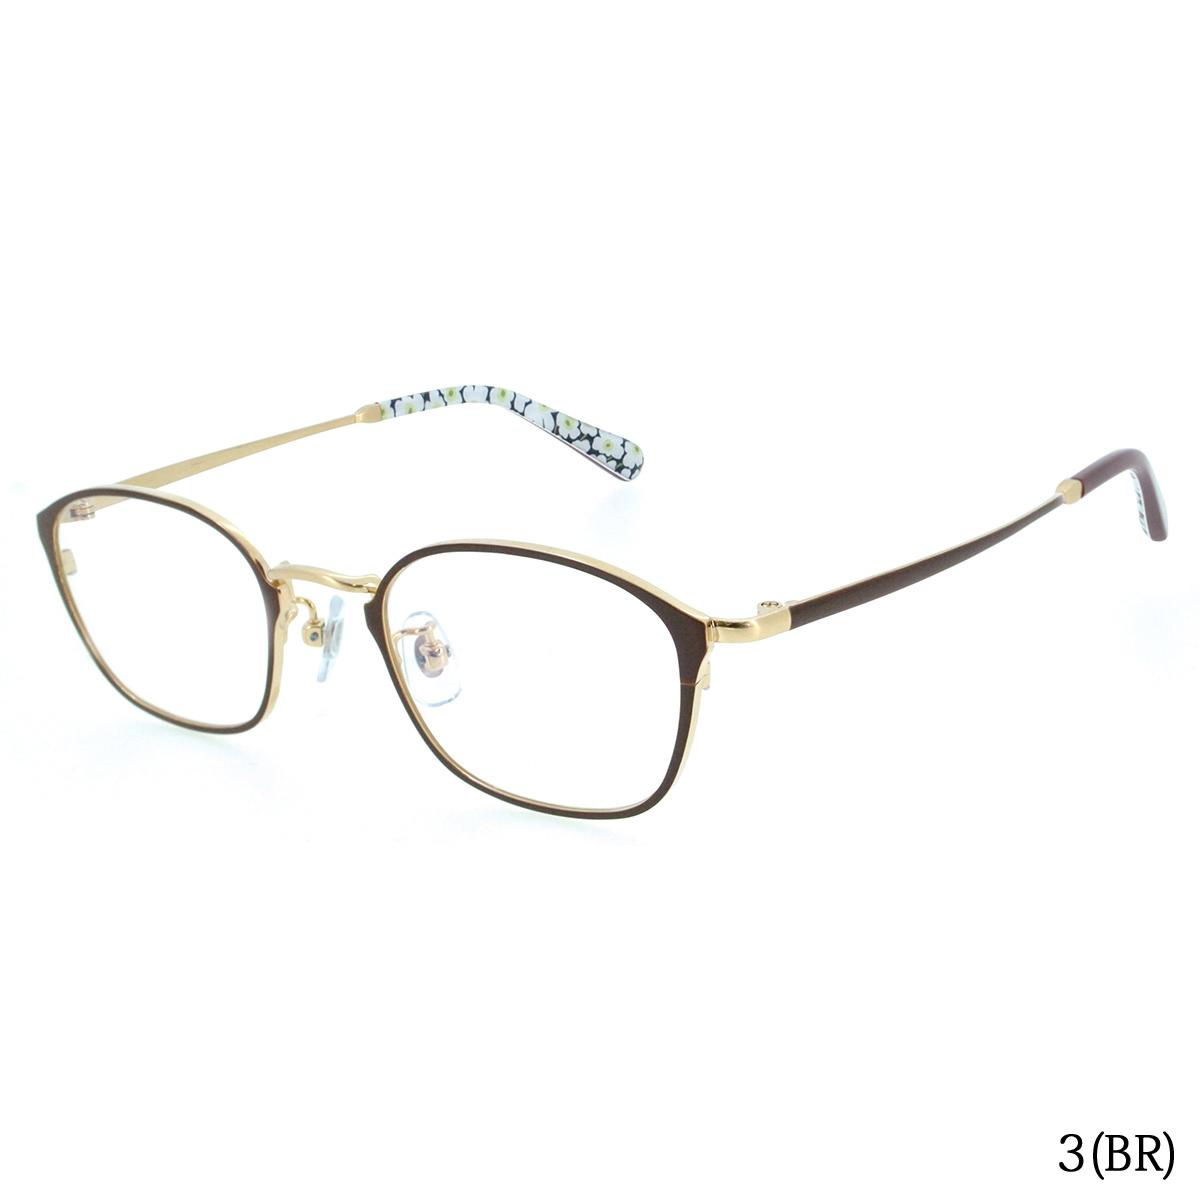 marimekko マリメッコ MINI UNIKKO ミニウニッコ 32-0022 メガネ/めがね/眼鏡/度付きメガネ/度入り/伊達メガネ